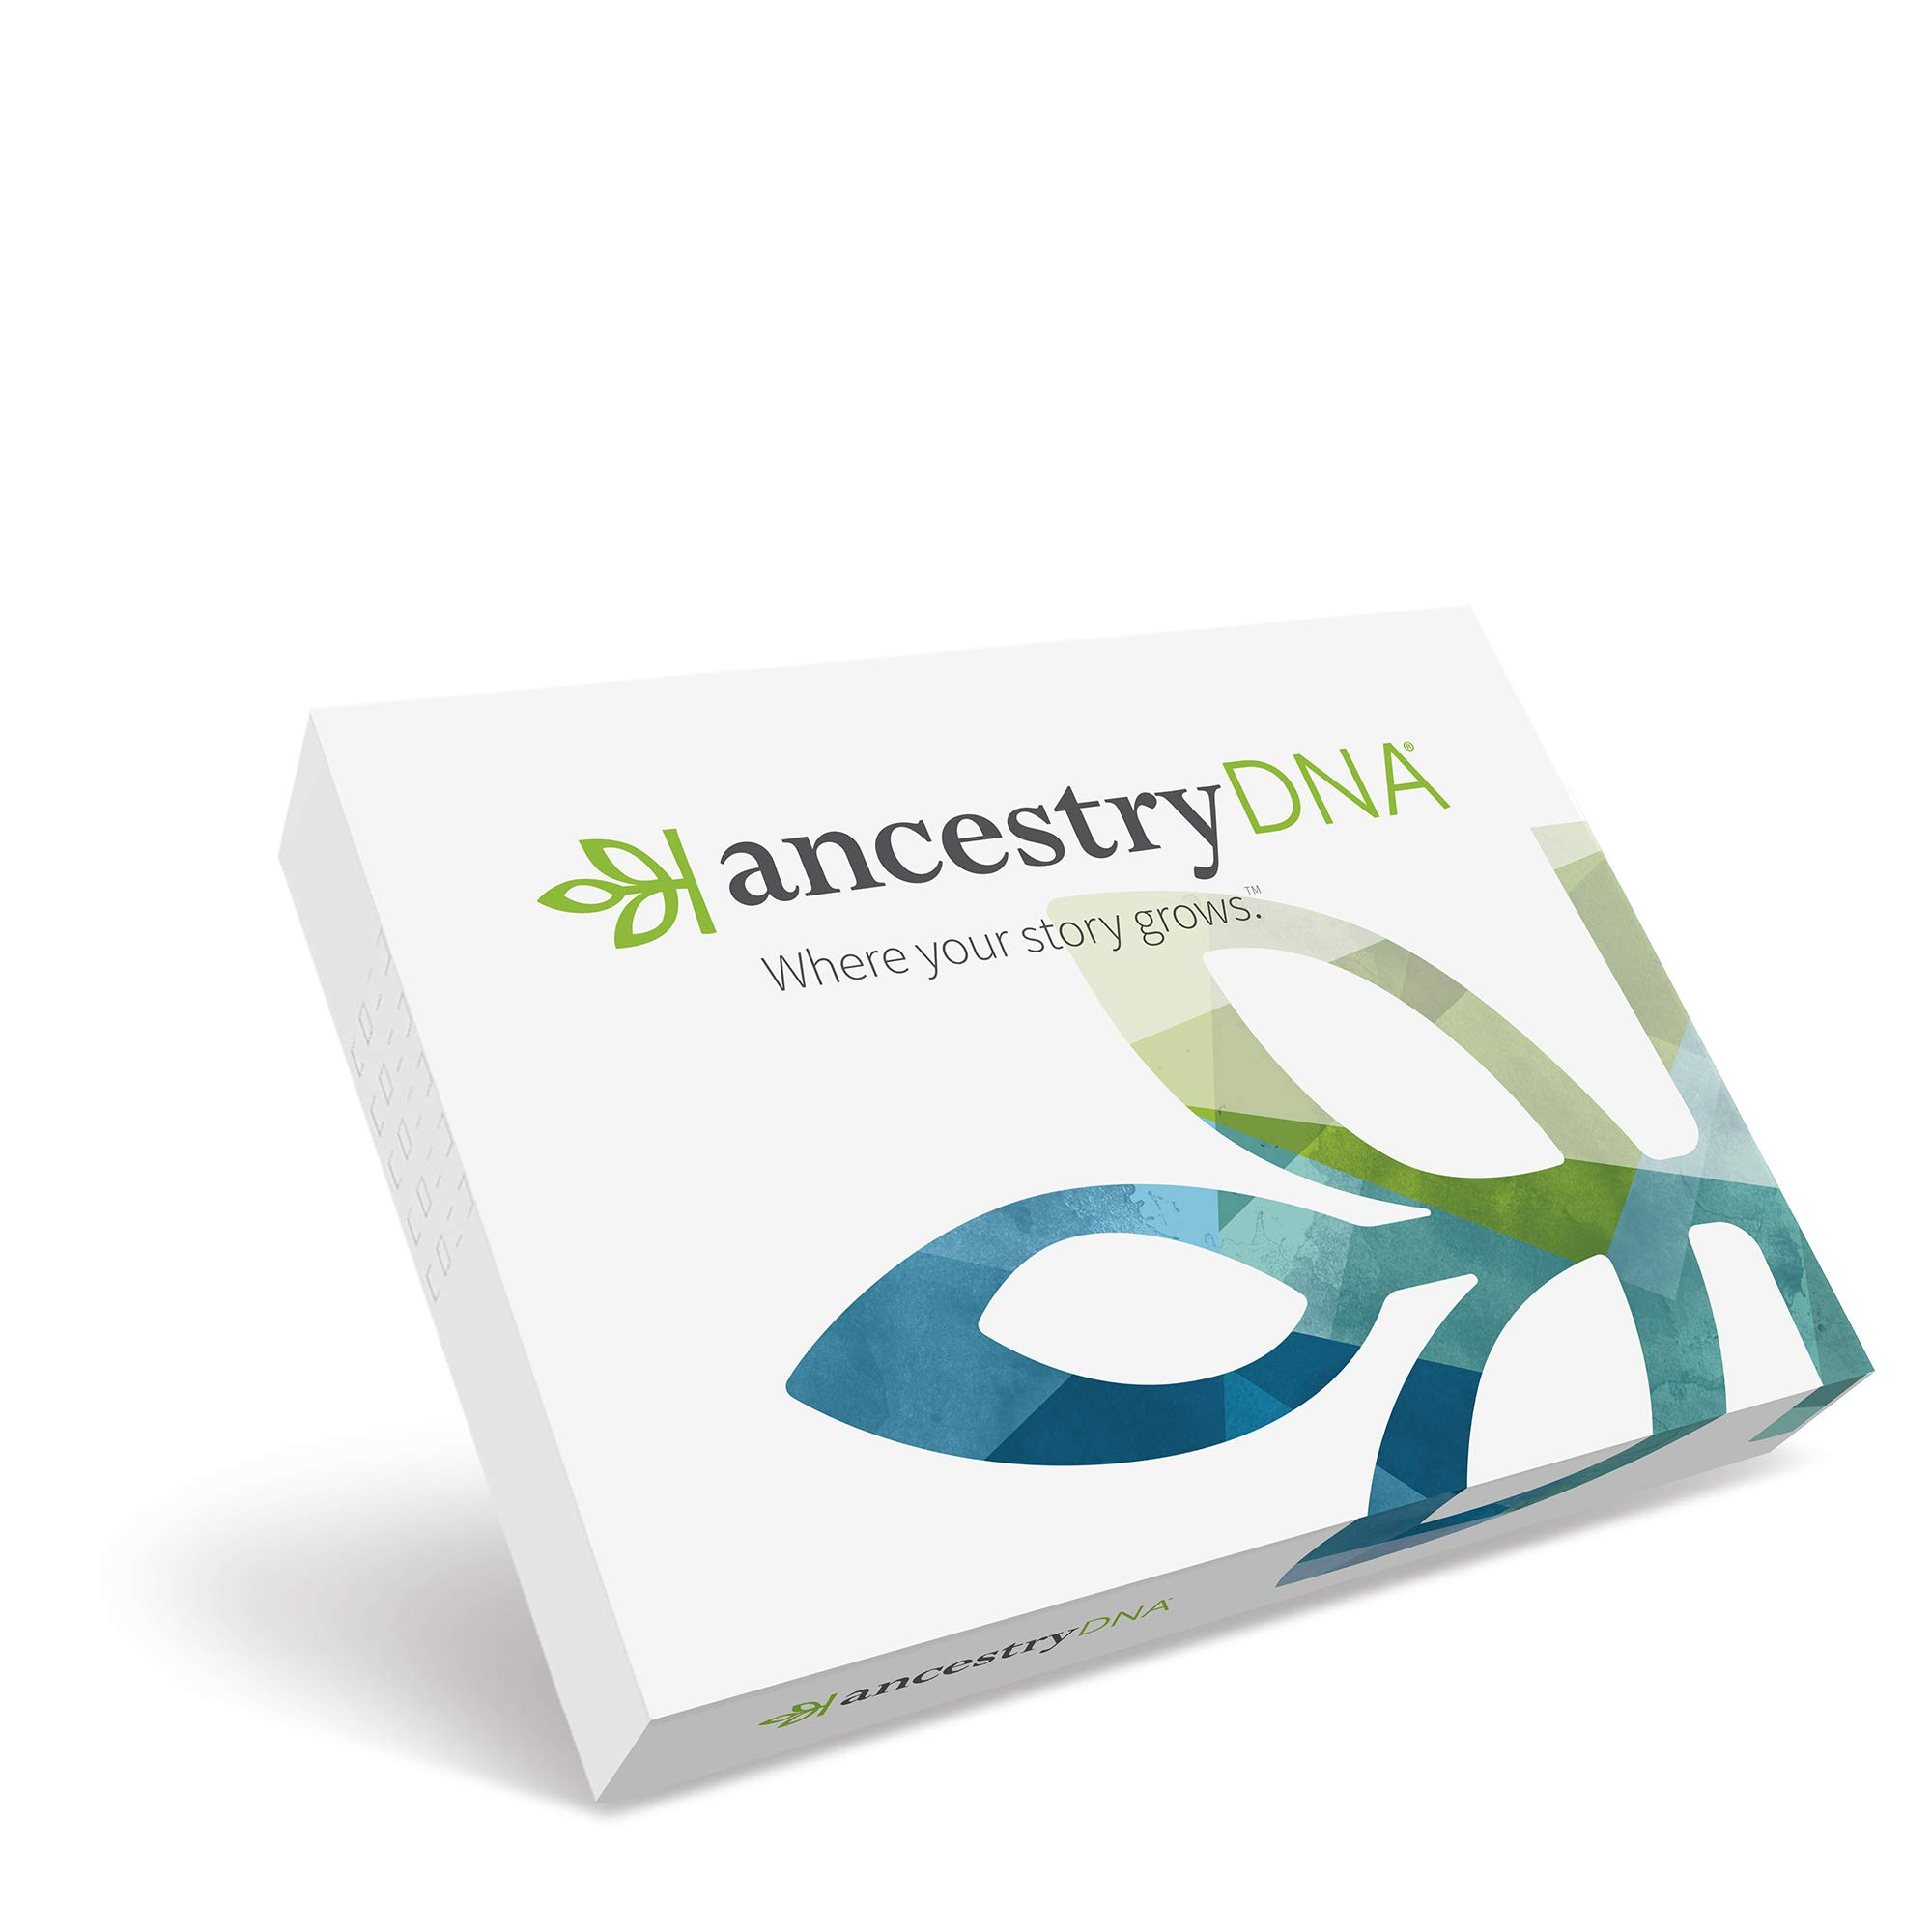 AncestryDNA: Genetic Ethnicity Test by AncestryDNA